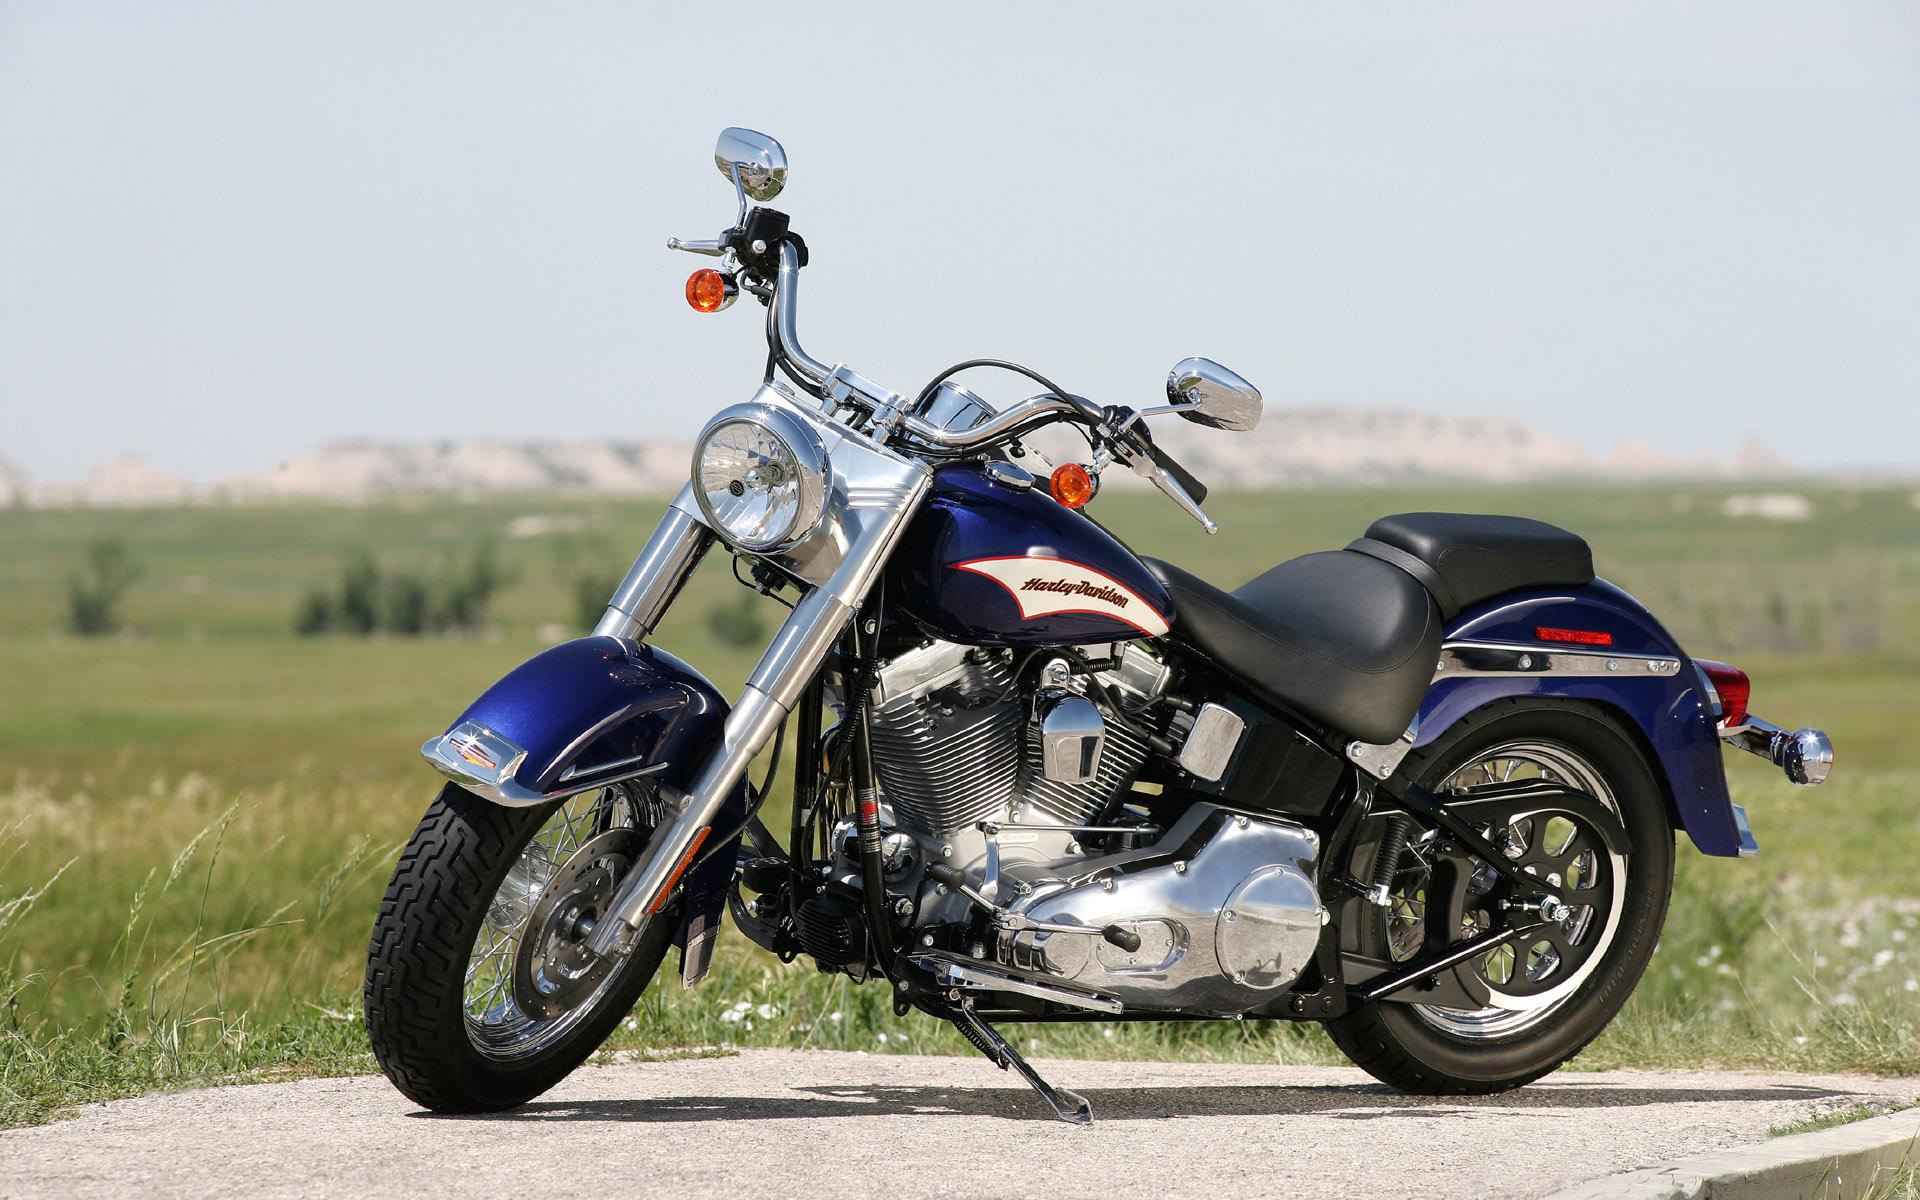 Harley Davidson Bike Hd Wallpapers New Wallpapers